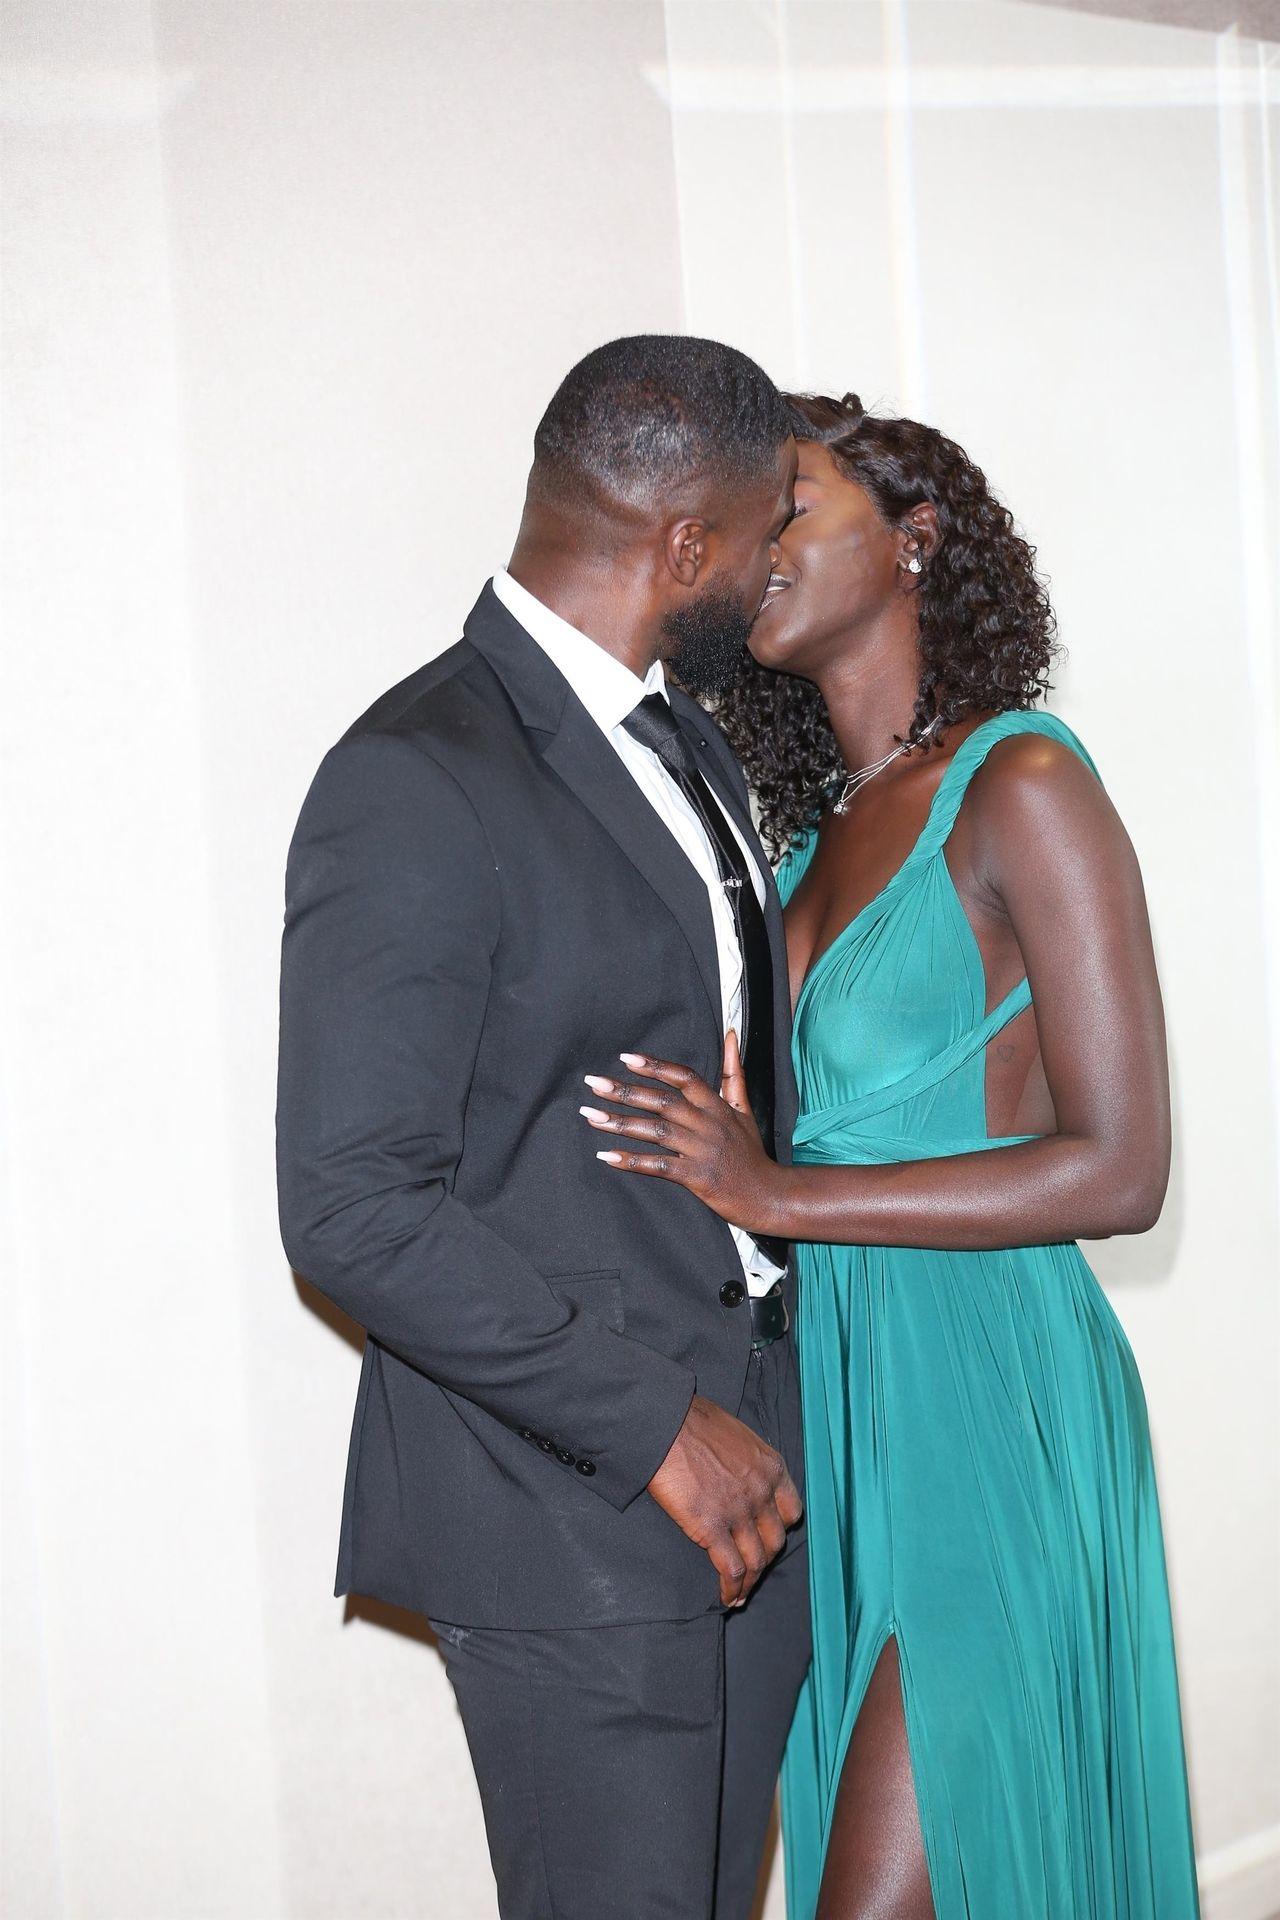 Mike Boateng & Priscilla Anyabu Are Seen At British Ethnic Diversity Sports Awards 0127